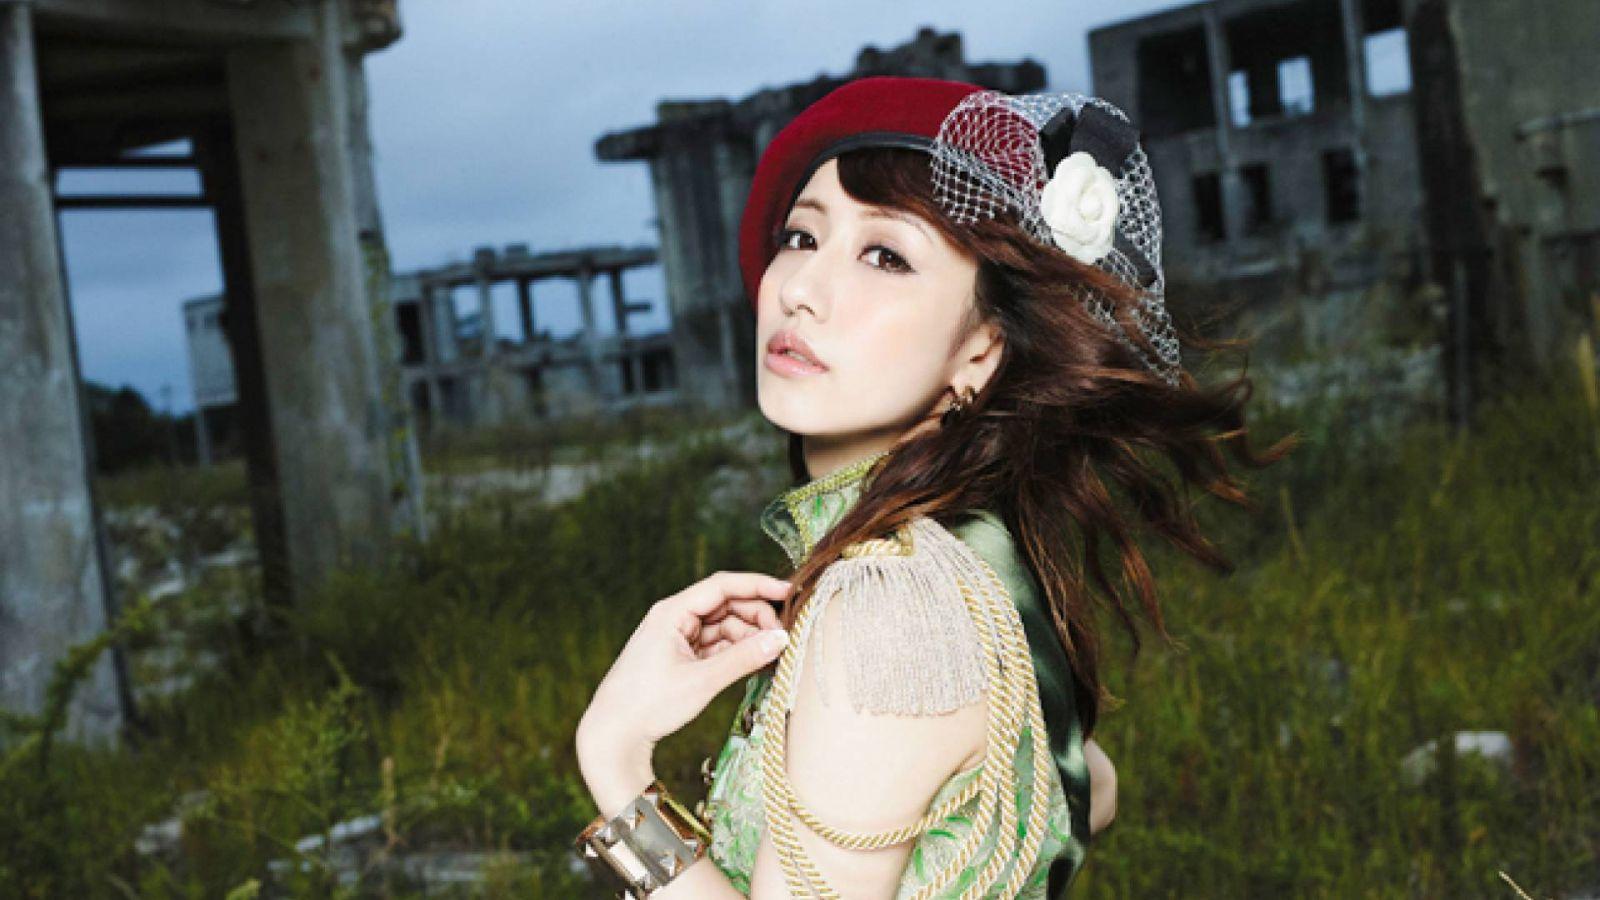 Novo single de Tamaki Nami © 2014 Warner Bros. Entertainment Inc. All right reserved.